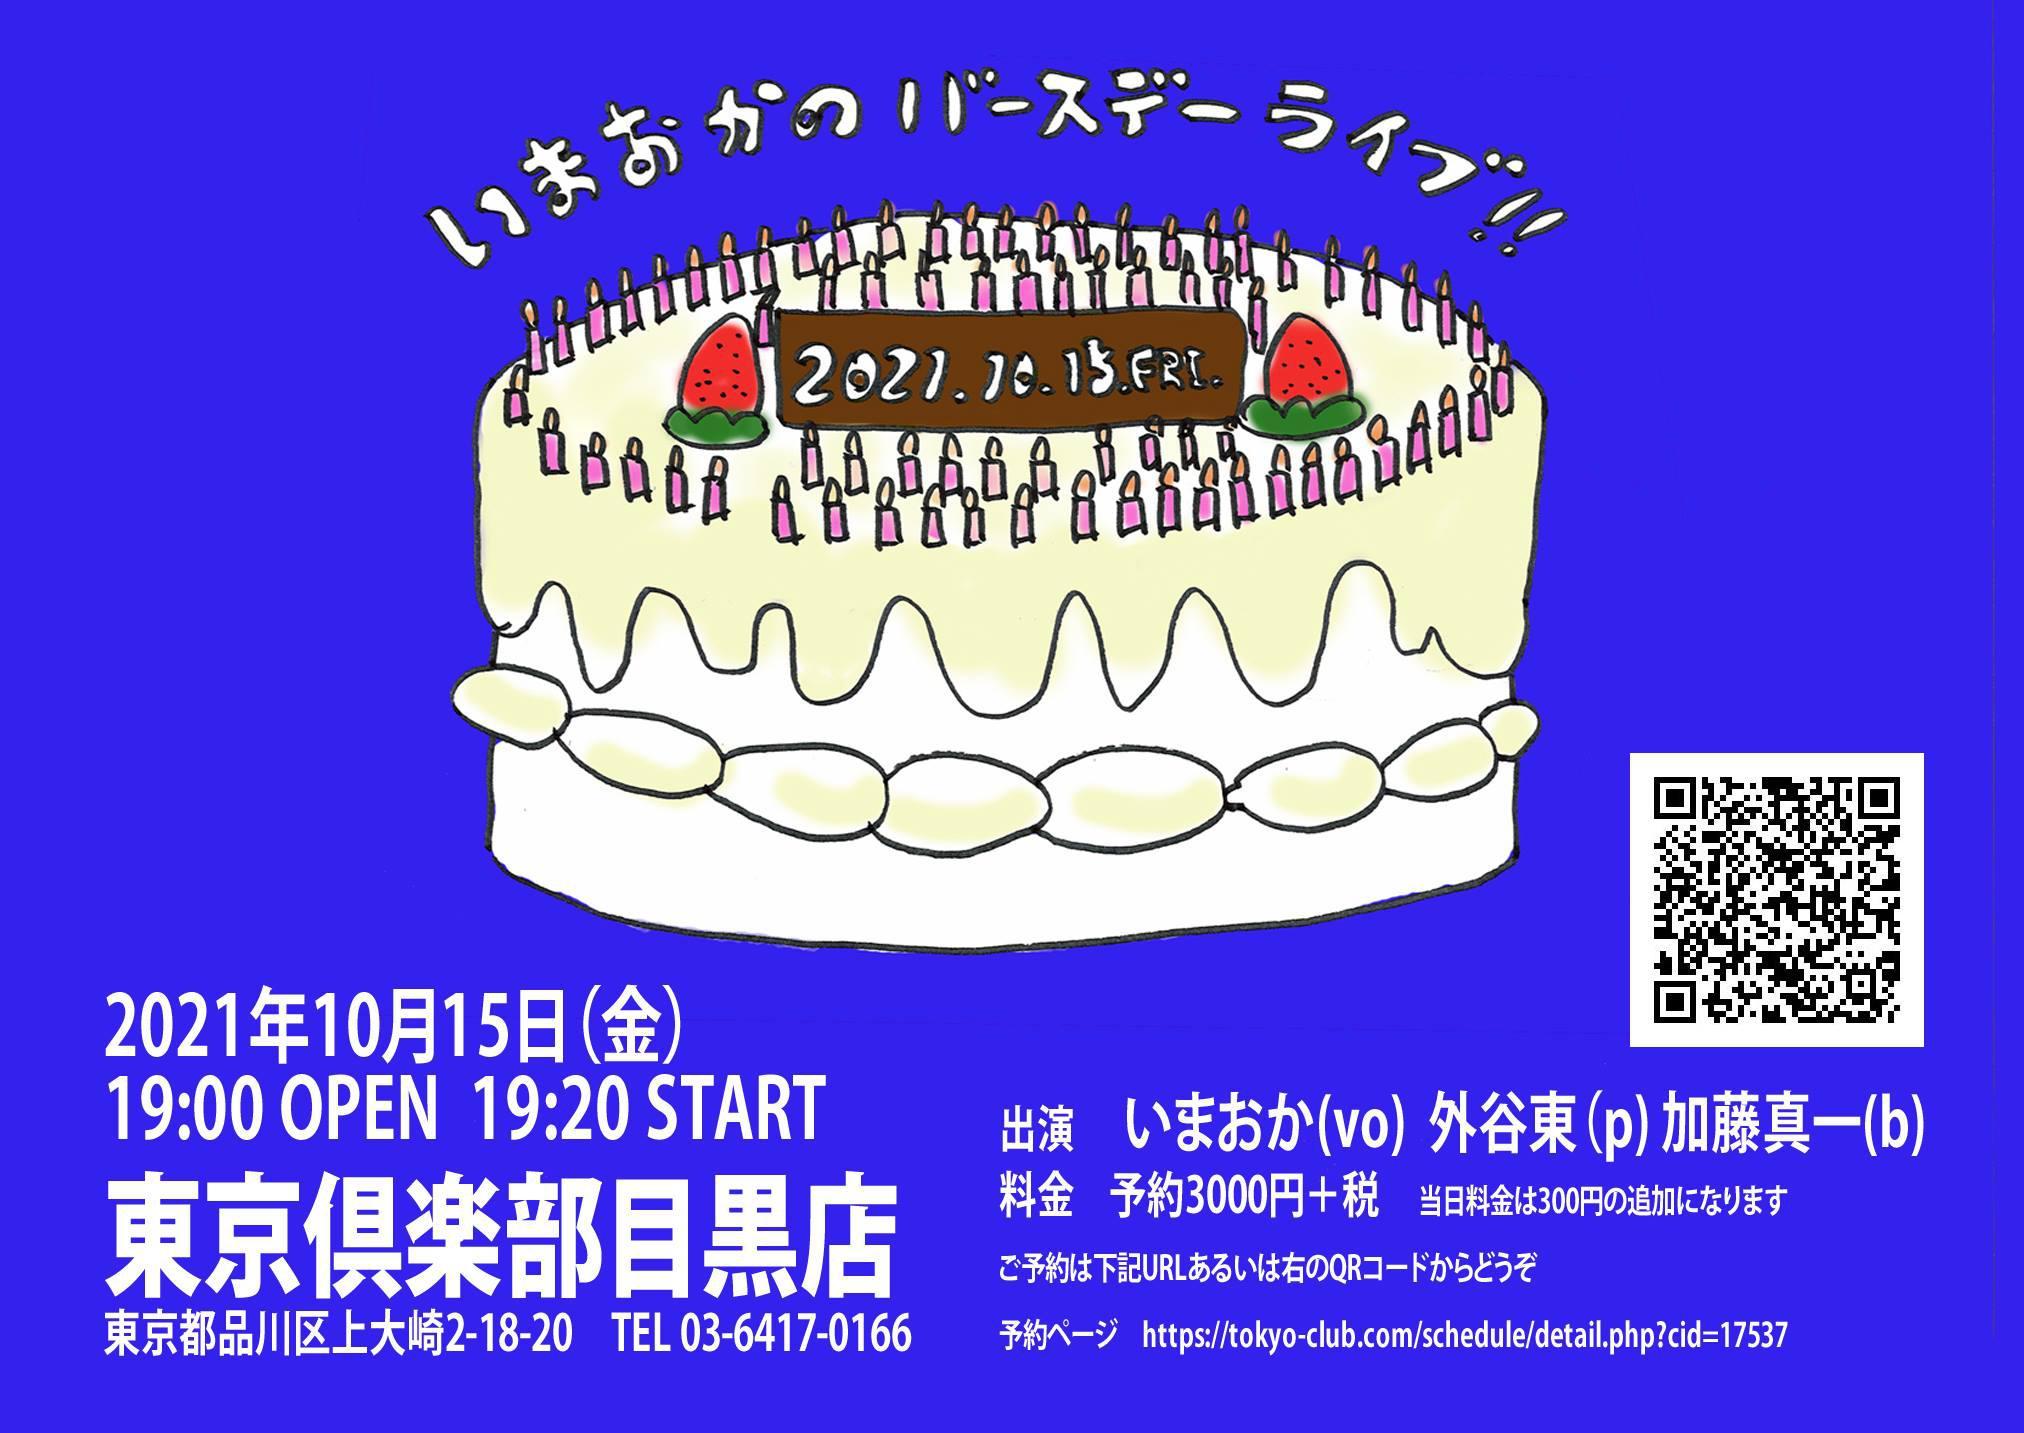 IMAOKA 73rd BIRTHDAY LIVE